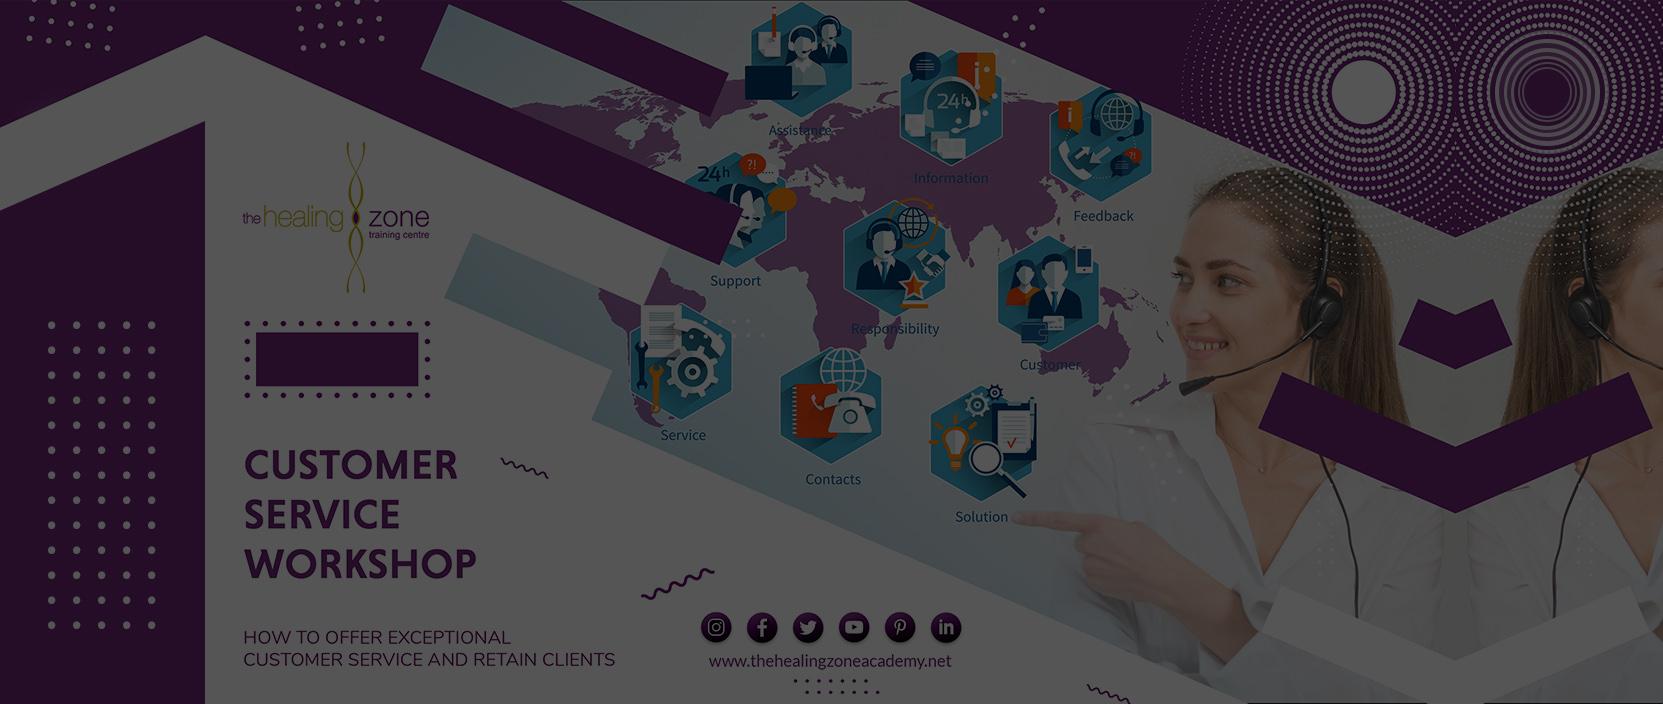 Customer Service eLearning